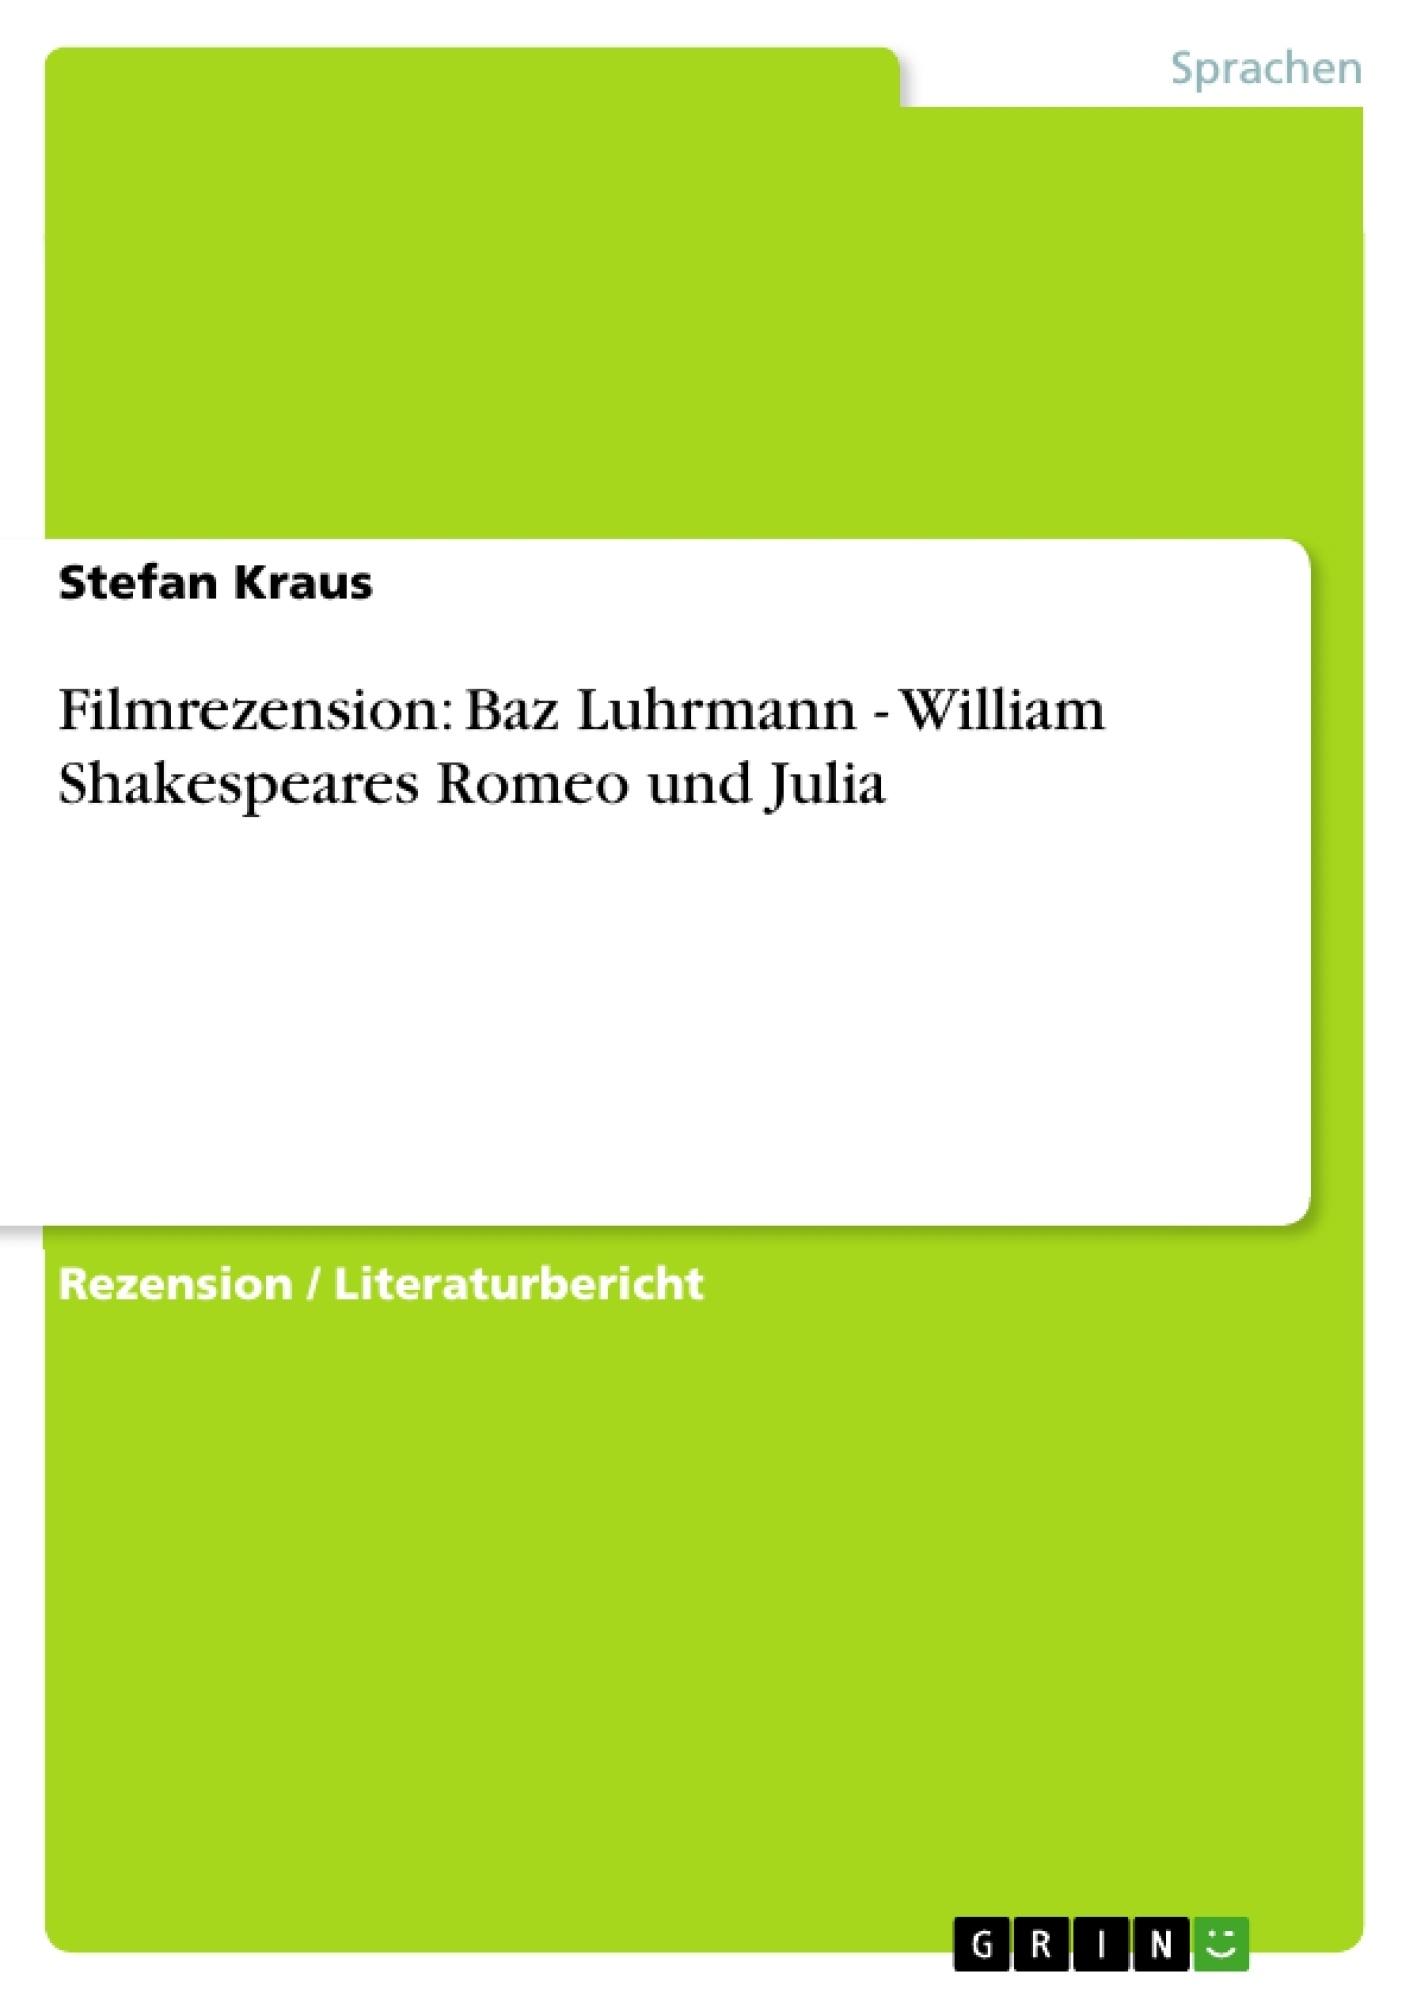 Titel: Filmrezension: Baz Luhrmann - William Shakespeares Romeo und Julia